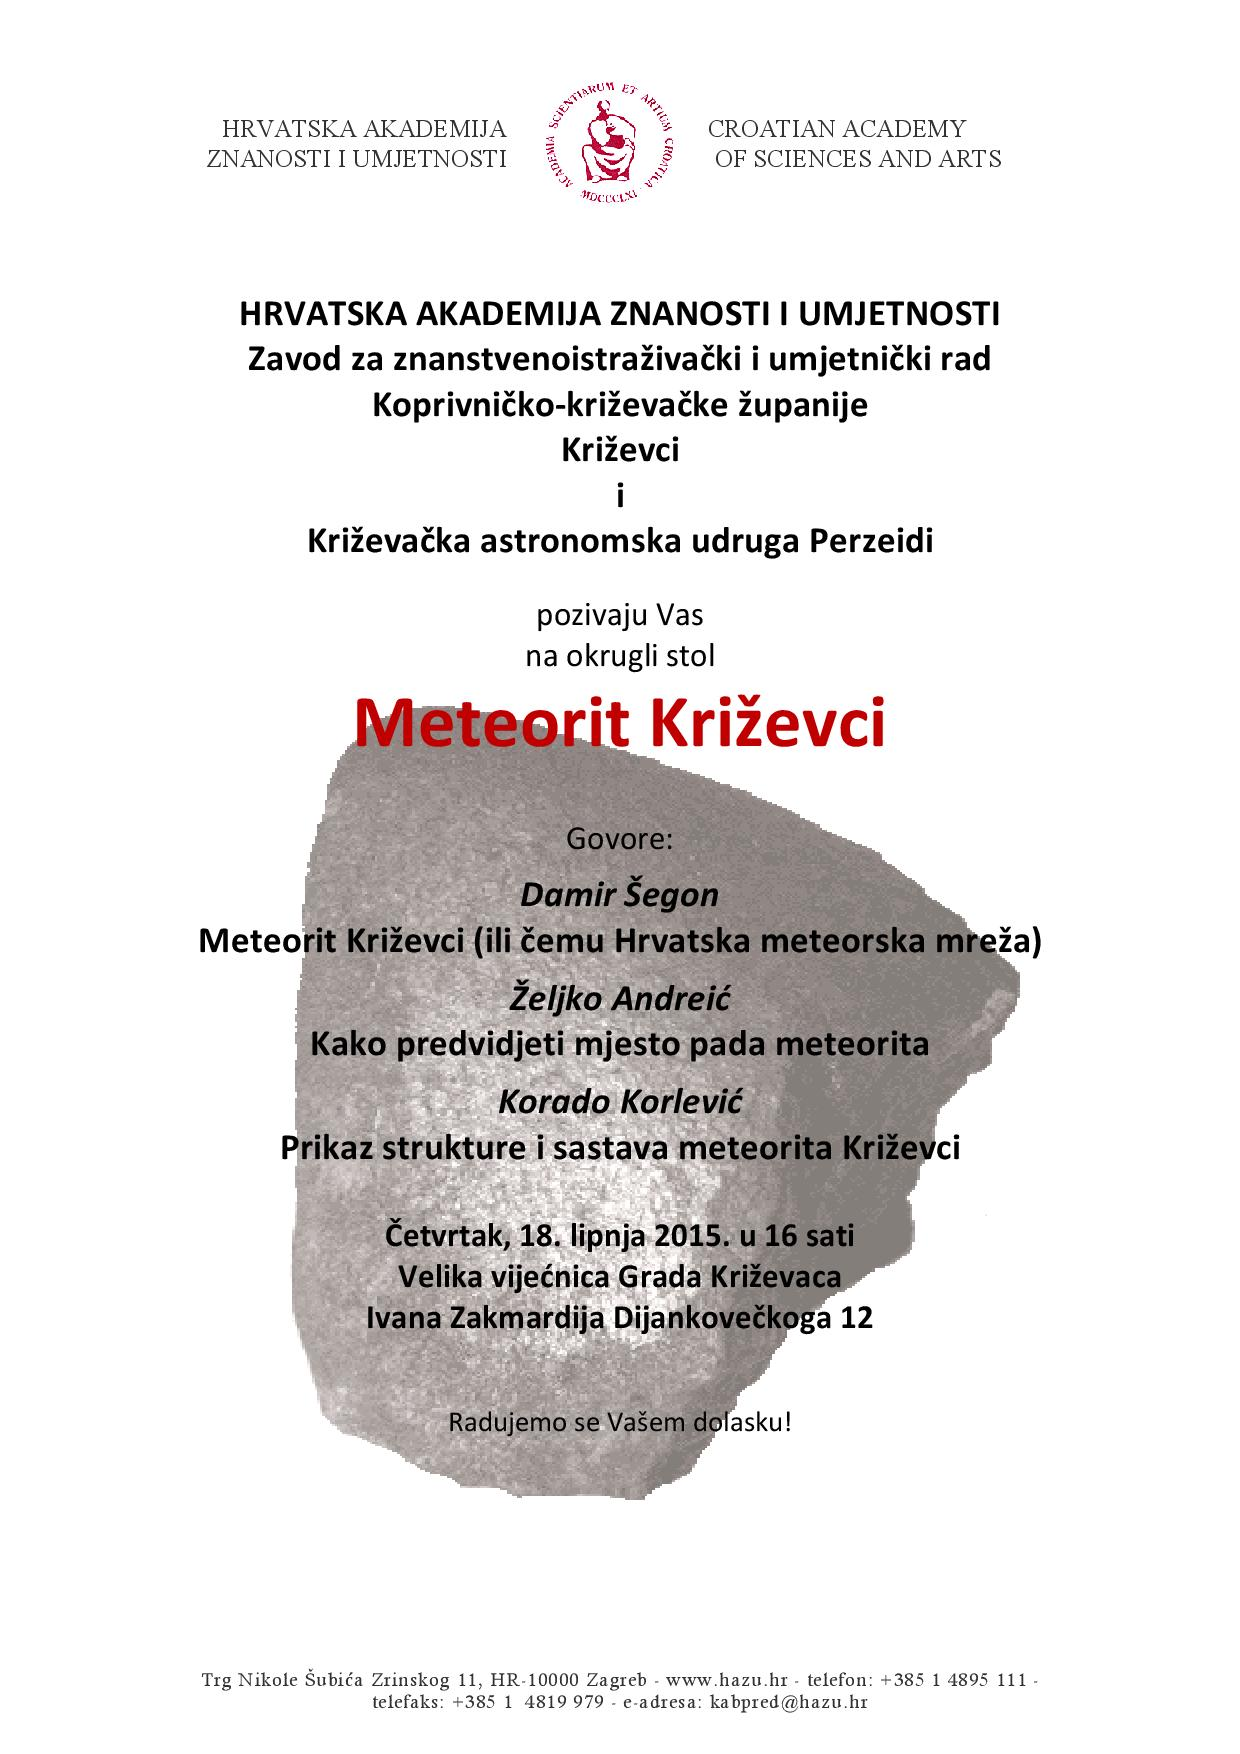 Okrugli stol METEORIT KRIZEVCI_ 18 06_poziv-page-001